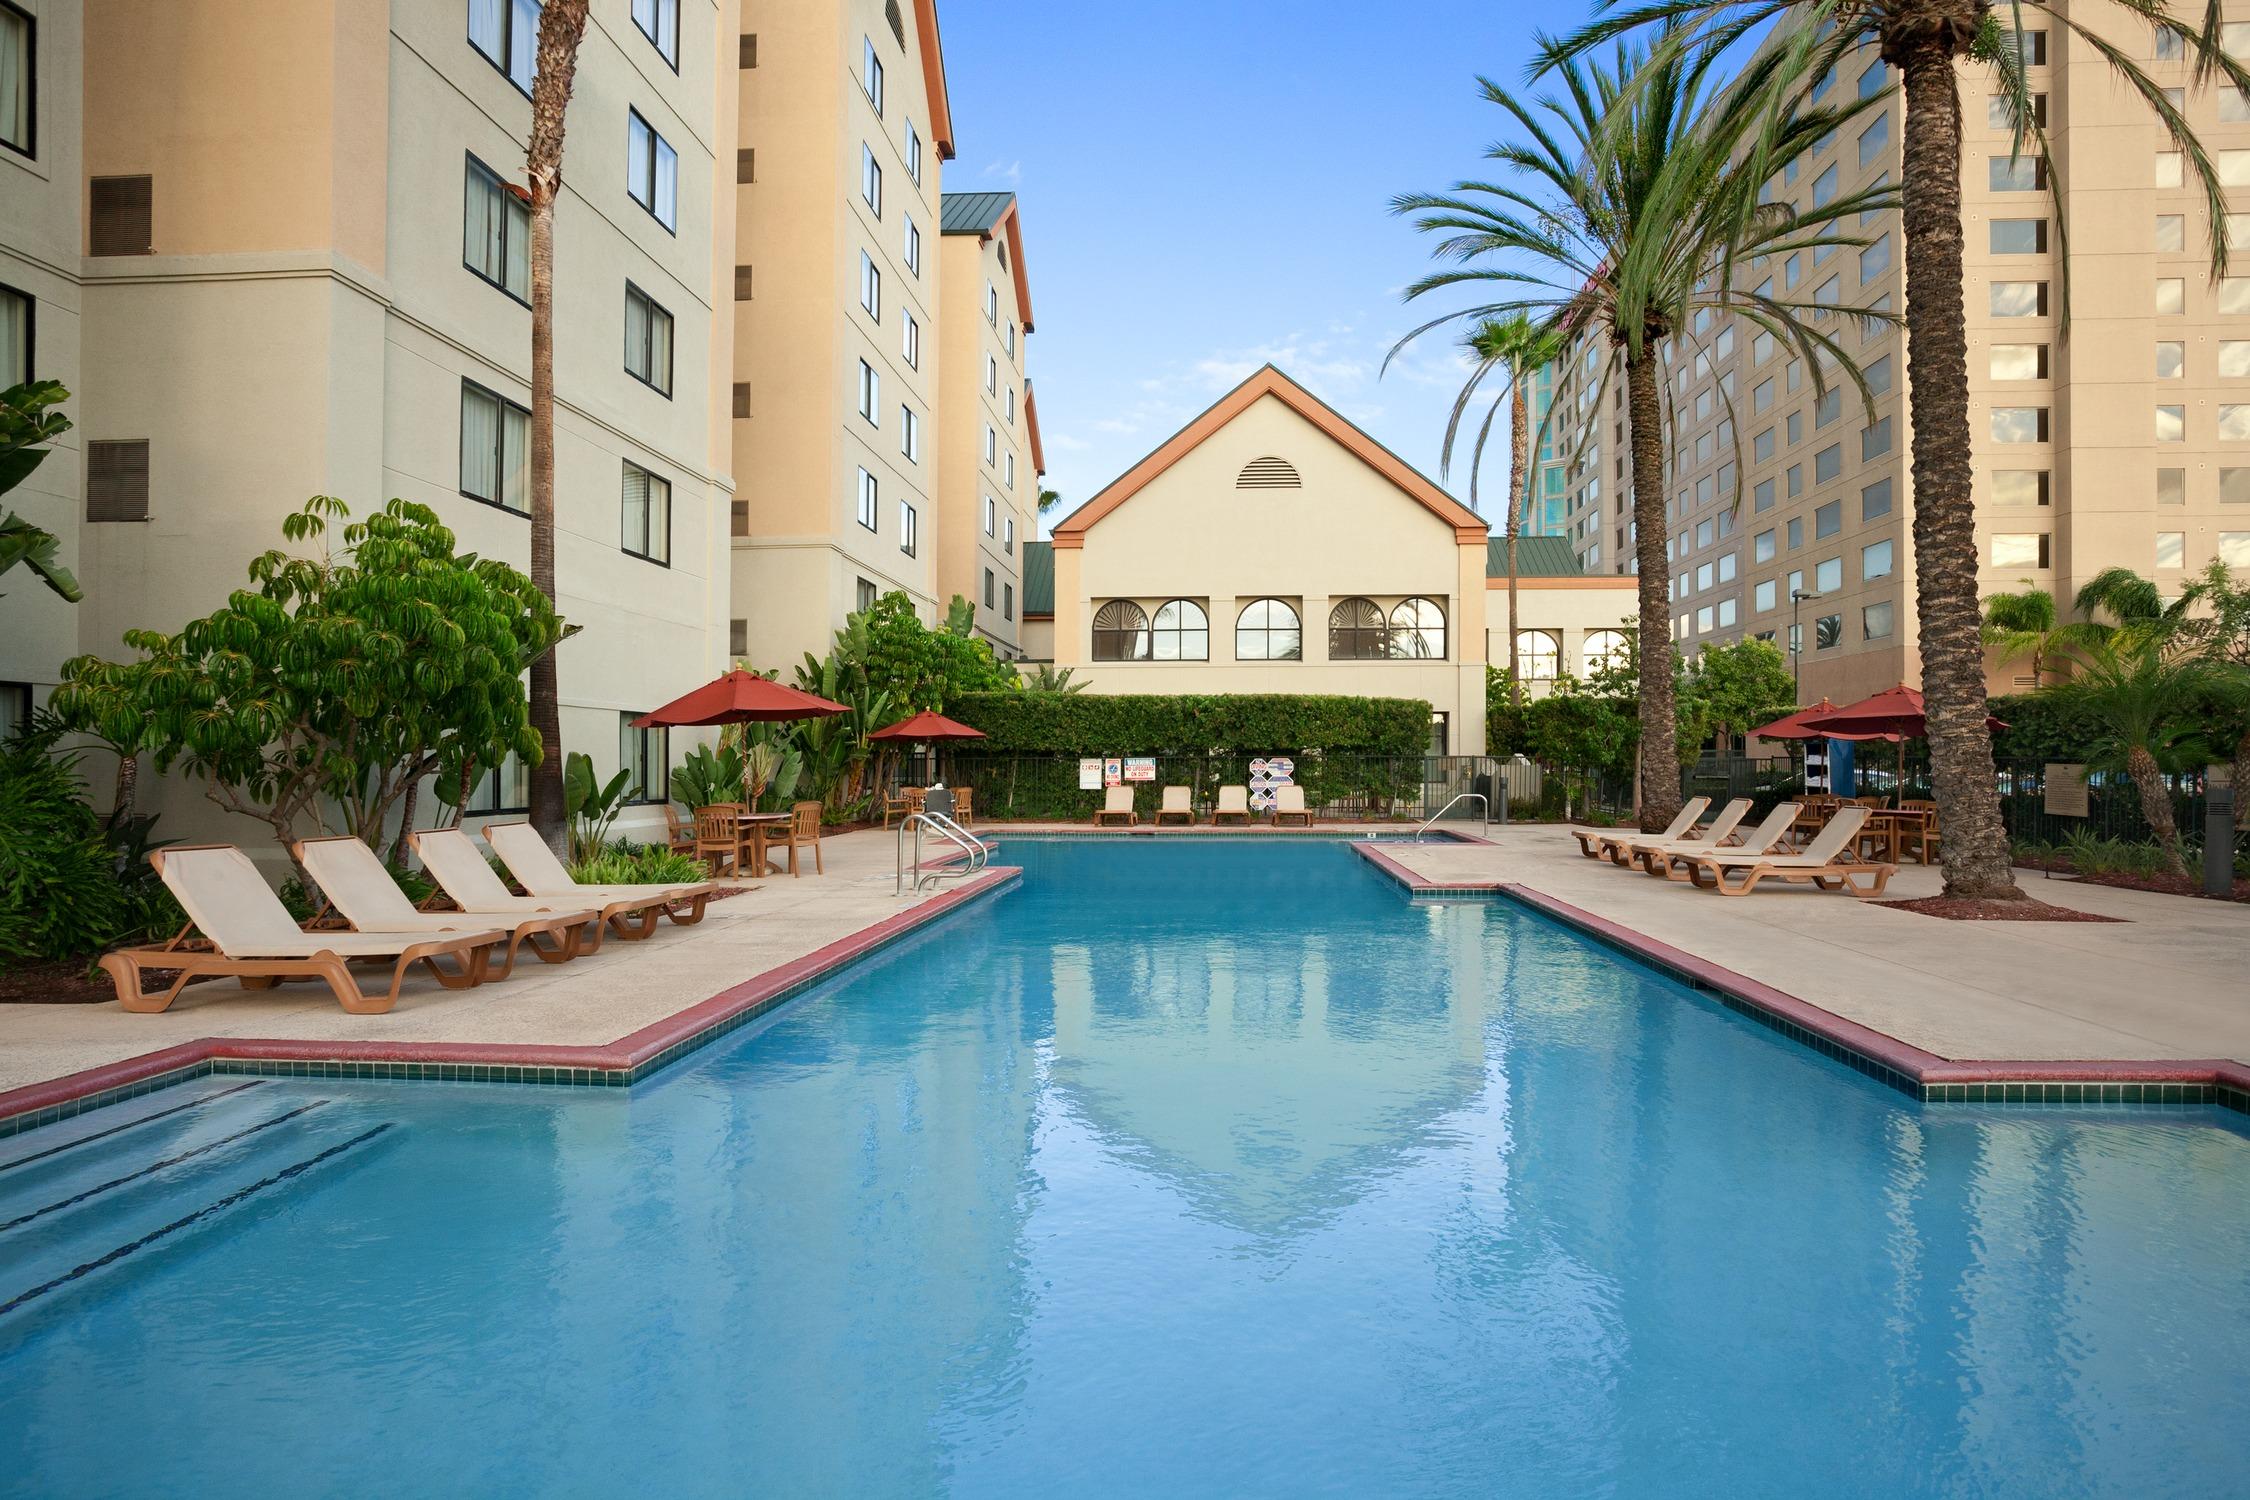 Stonebridge Companies Homewood Suites By Hilton Anaheim